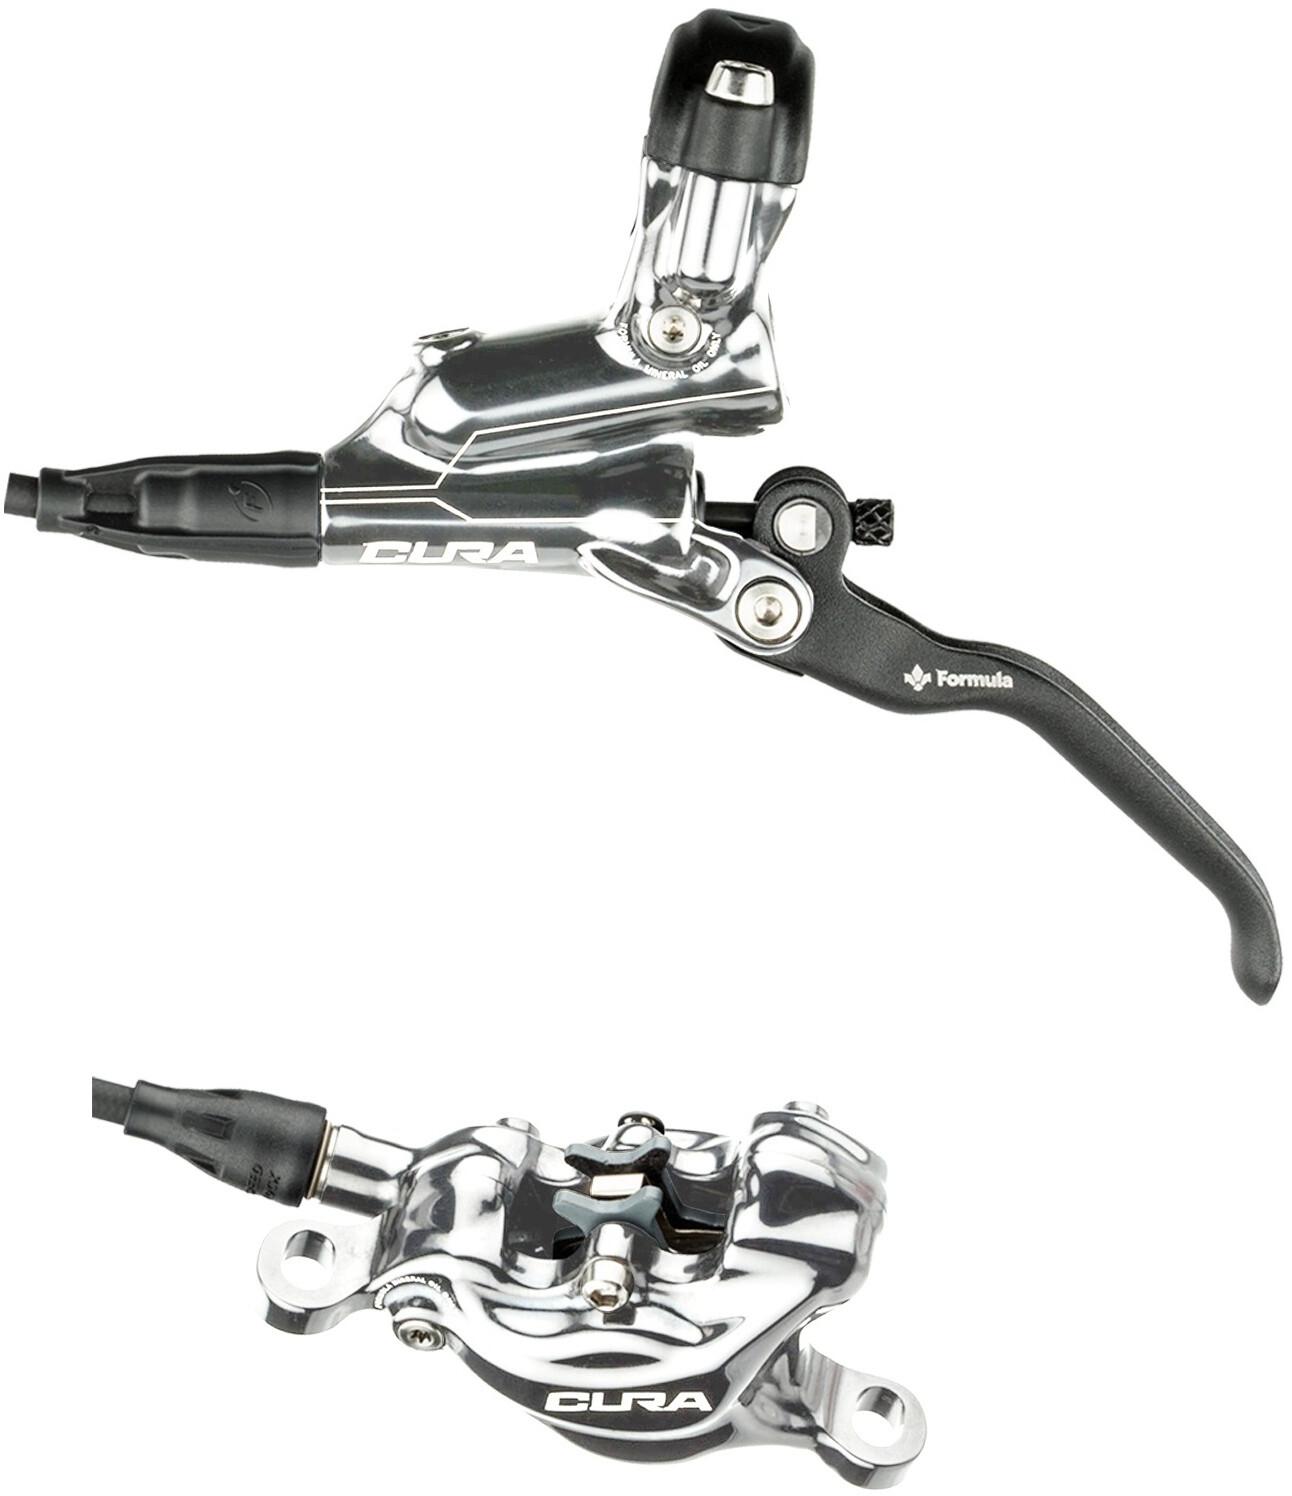 Formula Cura Skivebremse 175cm, polish (2019) | Brake pads